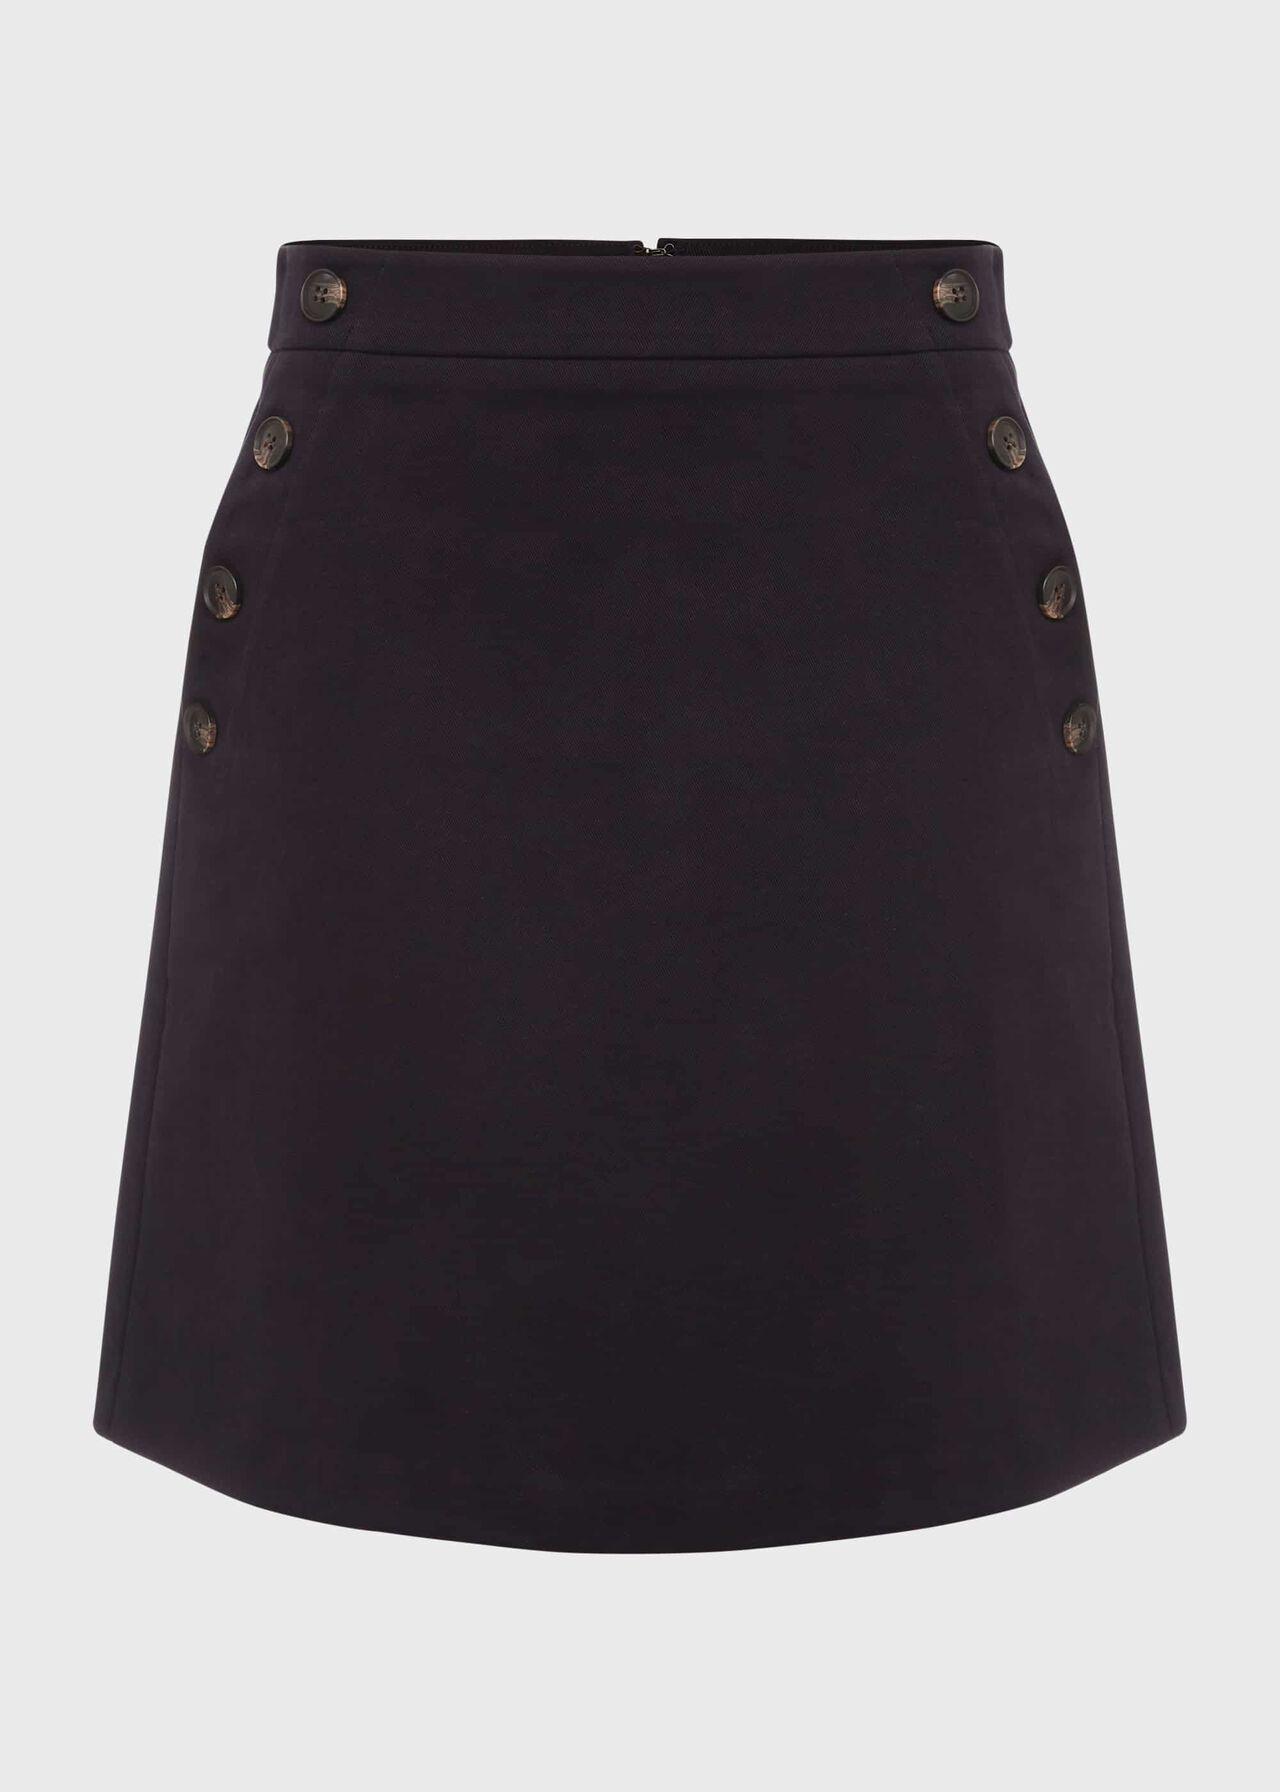 Jordan Cotton Blend A Line Skirt, Navy, hi-res